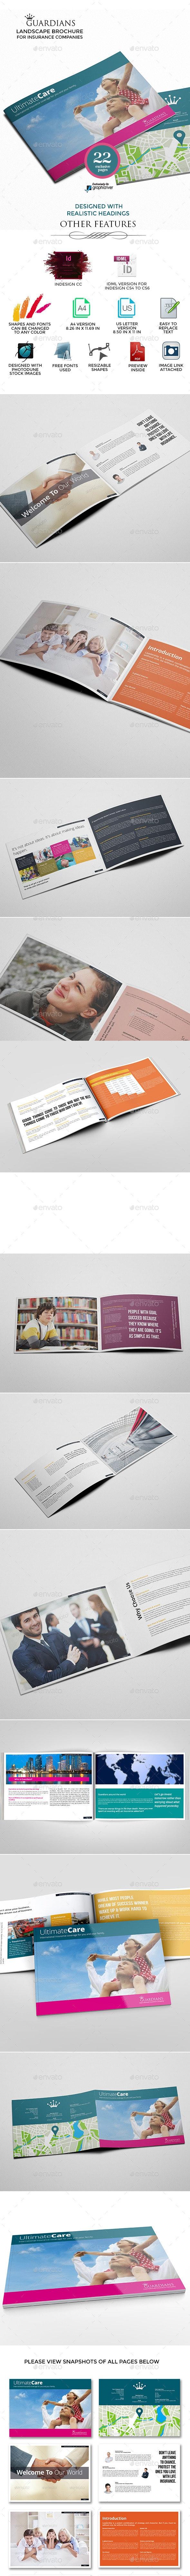 Landscape Brochure for Insurance Companies - Corporate Brochures